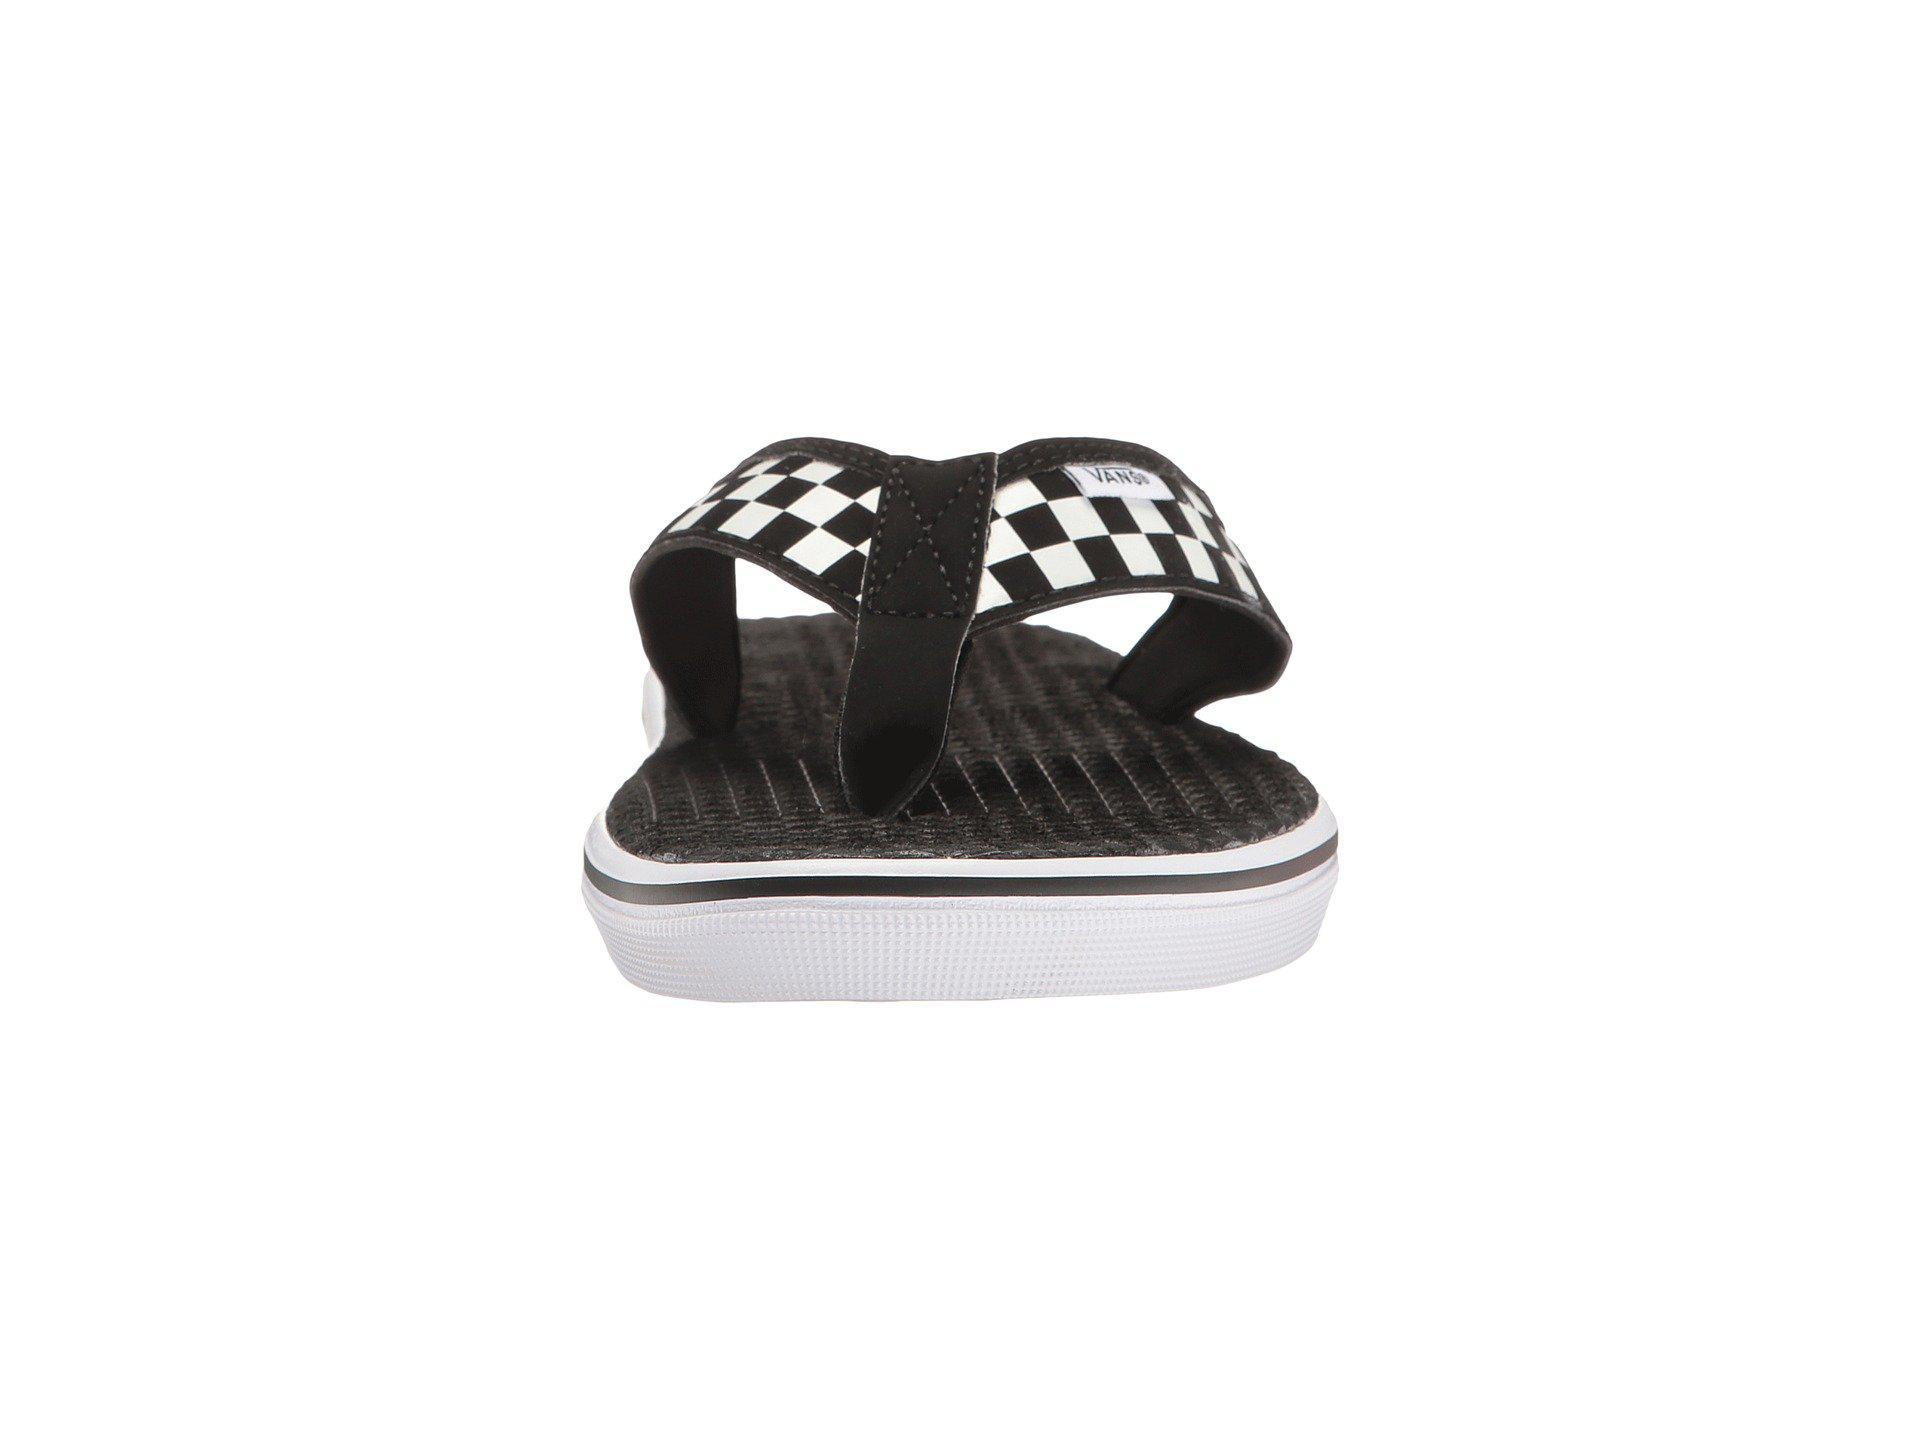 bb6226af31545b Vans - La Costa Lite ((checkerboard) Black white) Men s Sandals for. View  fullscreen